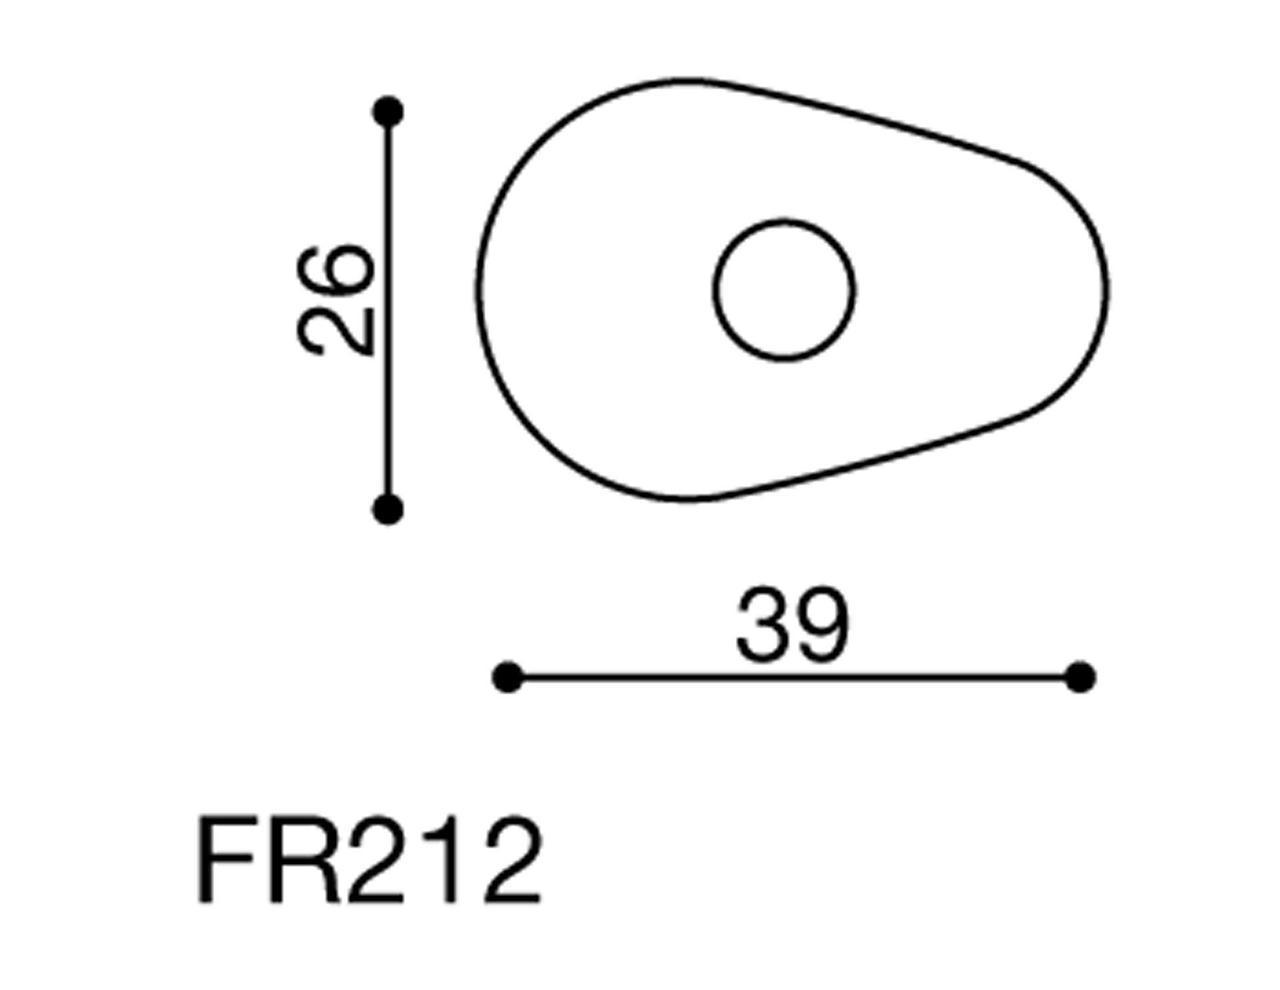 Rizoma Indicator Light Adaptors Express Post Delivery